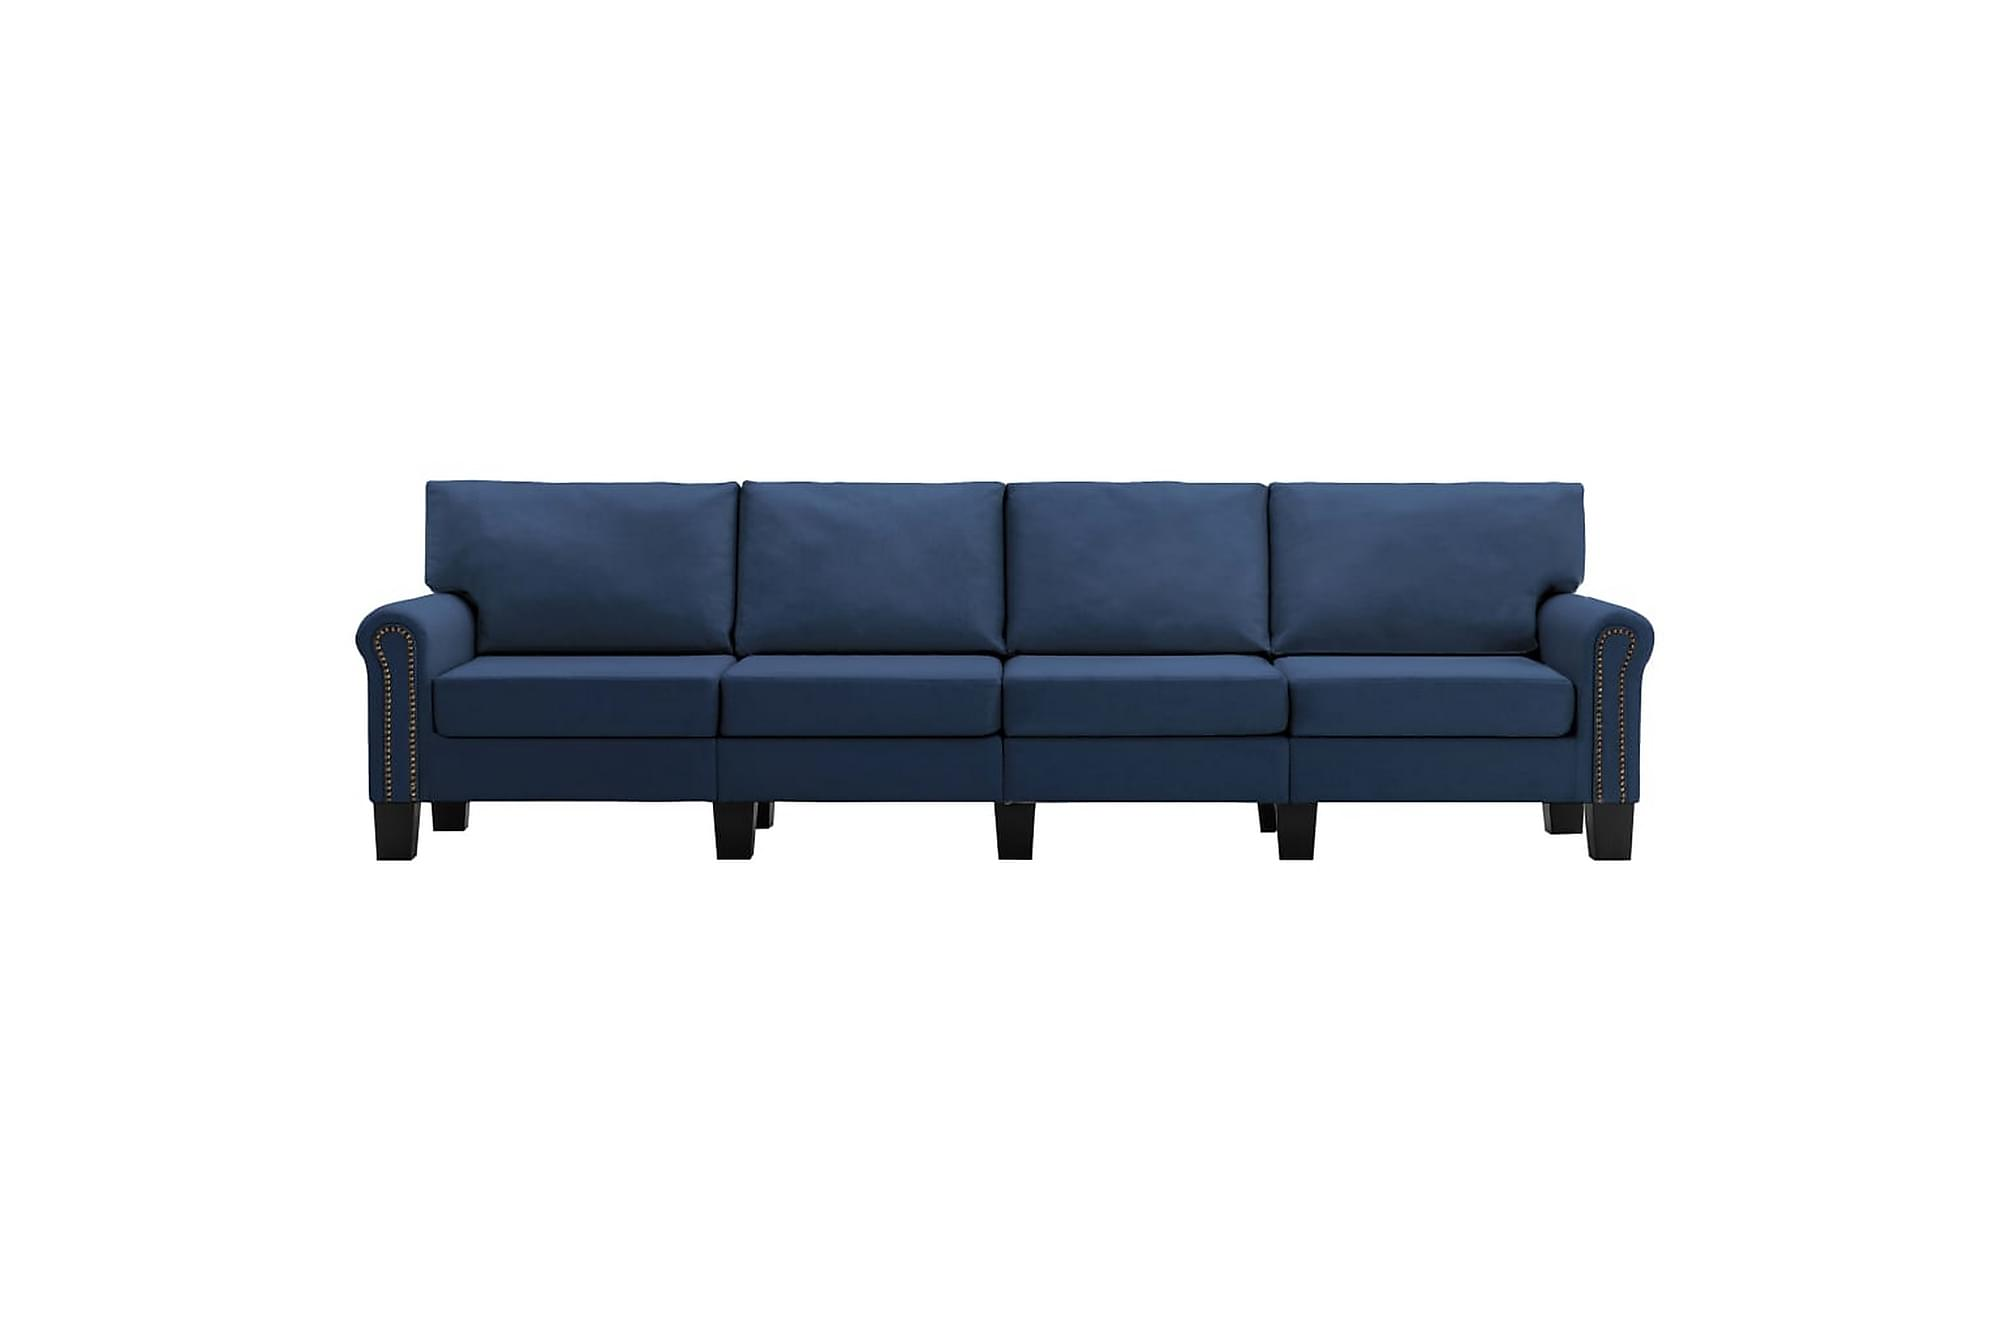 4-sitssoffa blå tyg